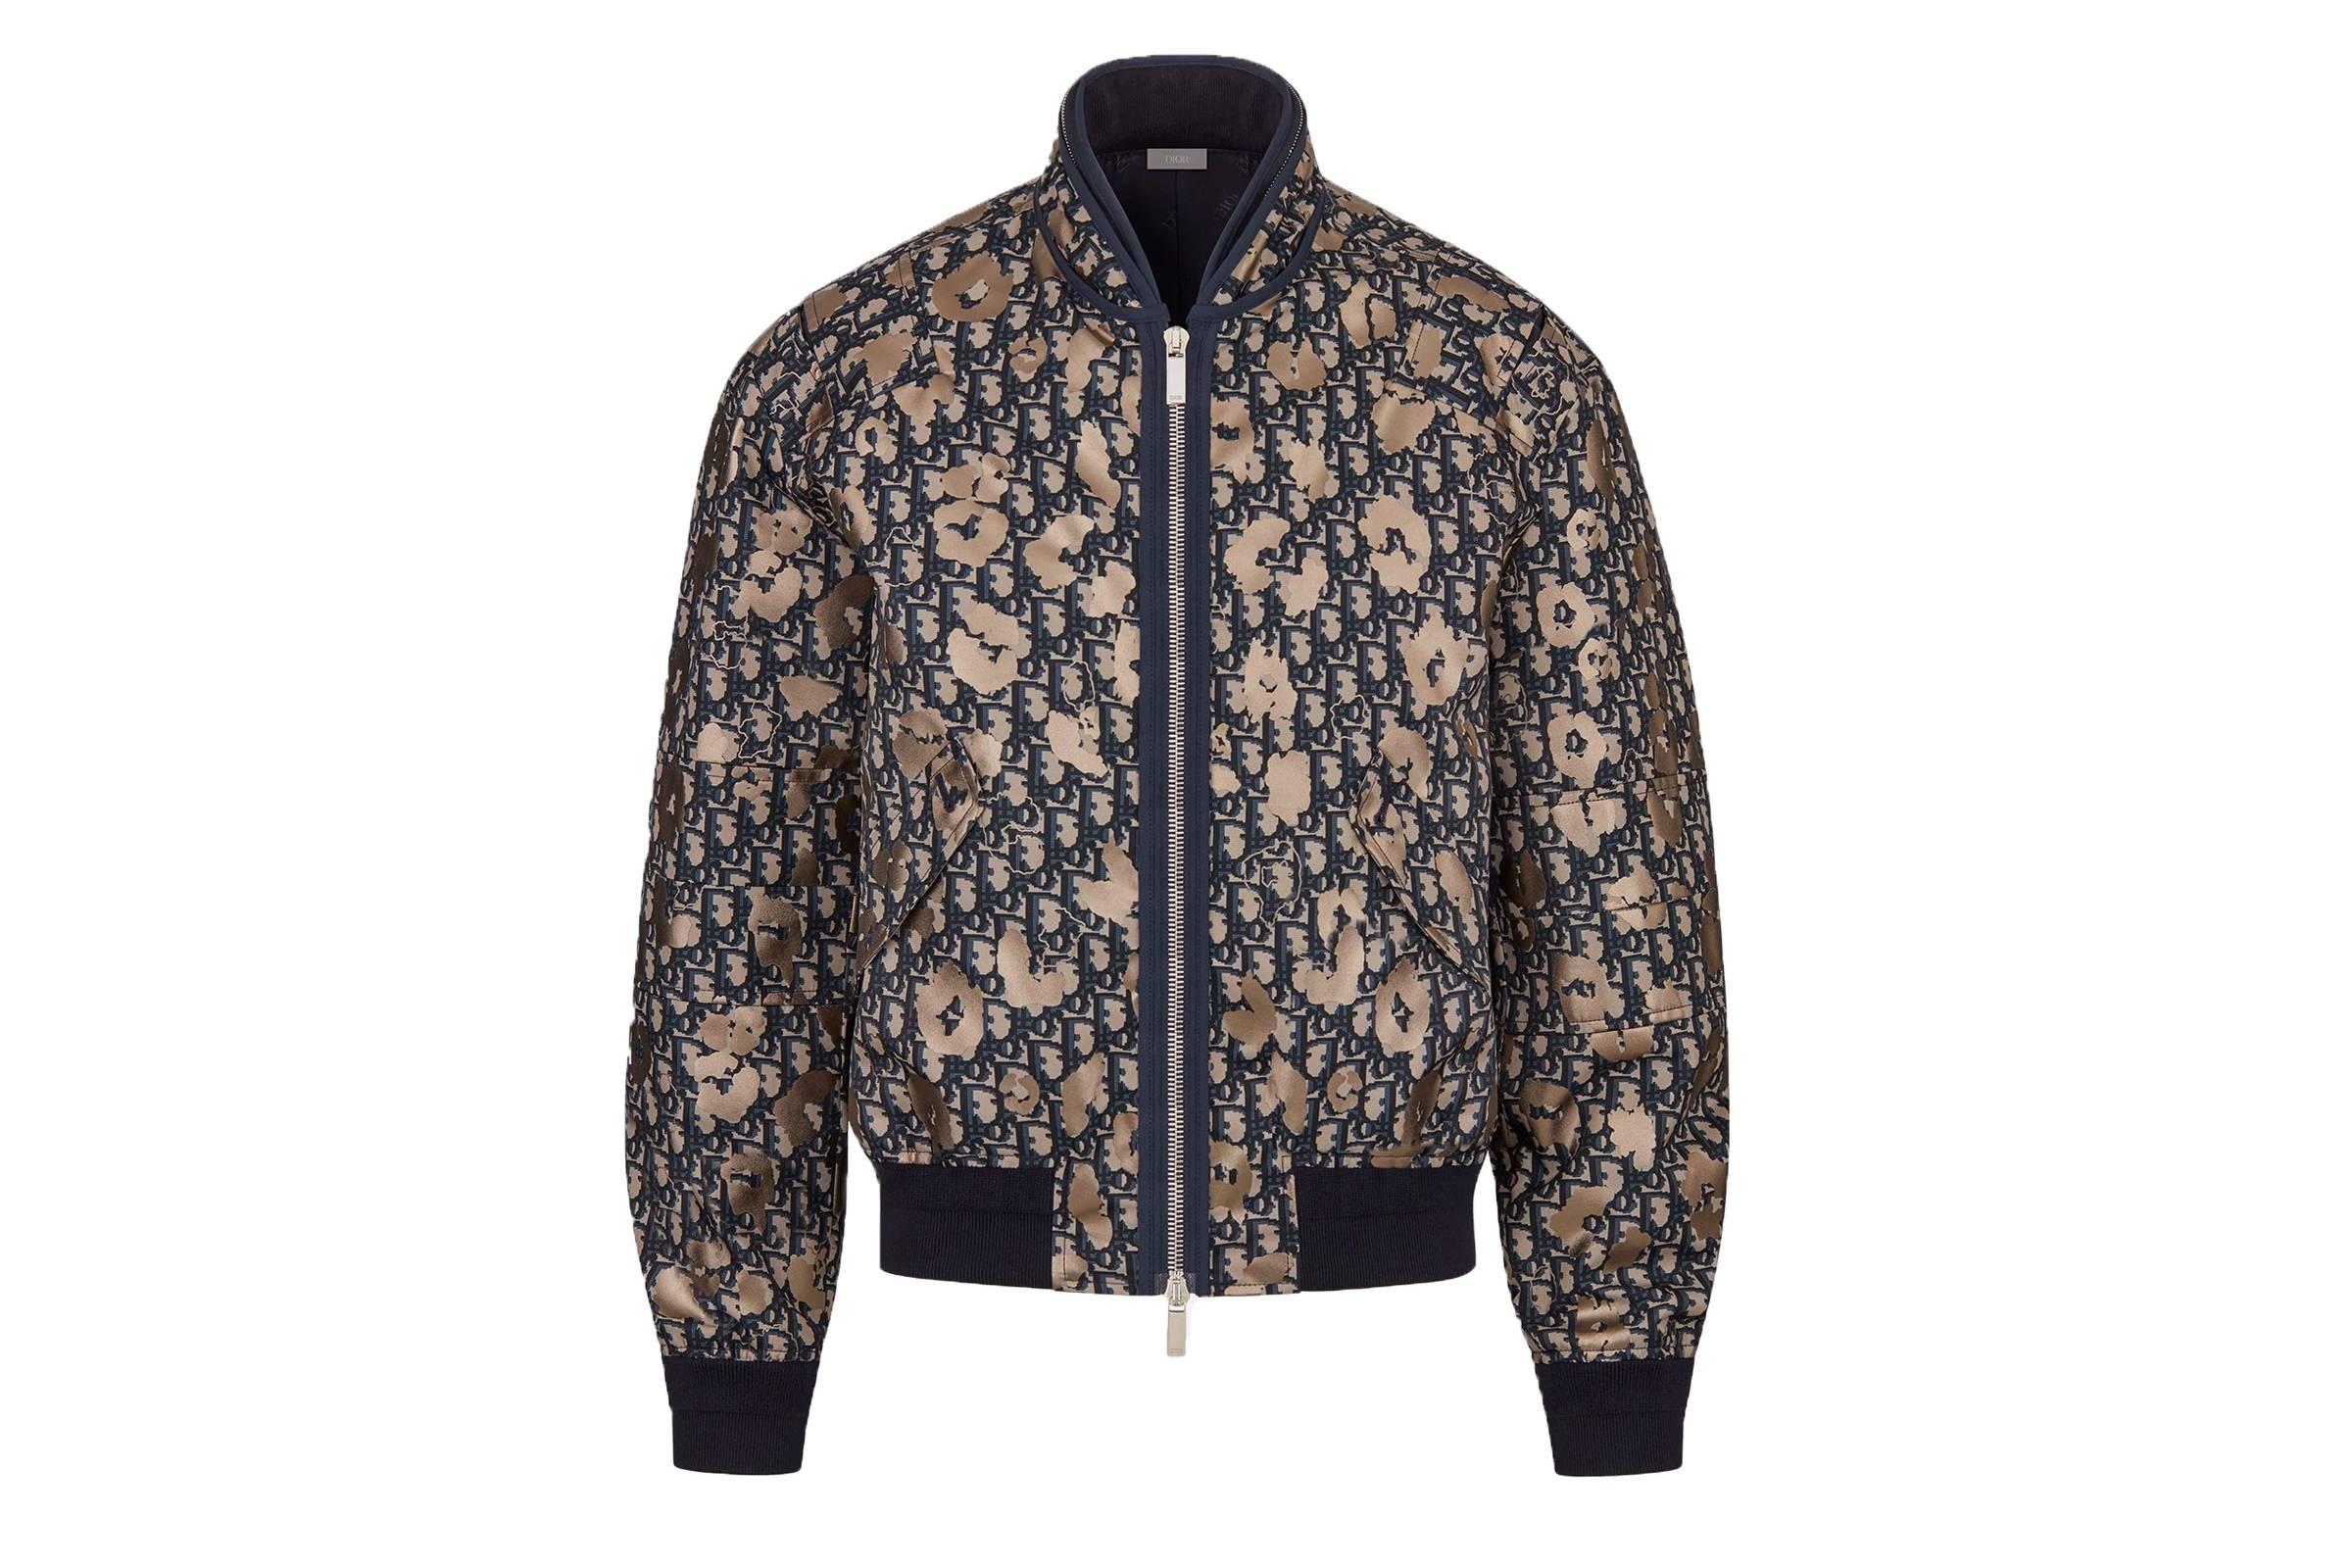 Dior Oblique Bomber Jacket